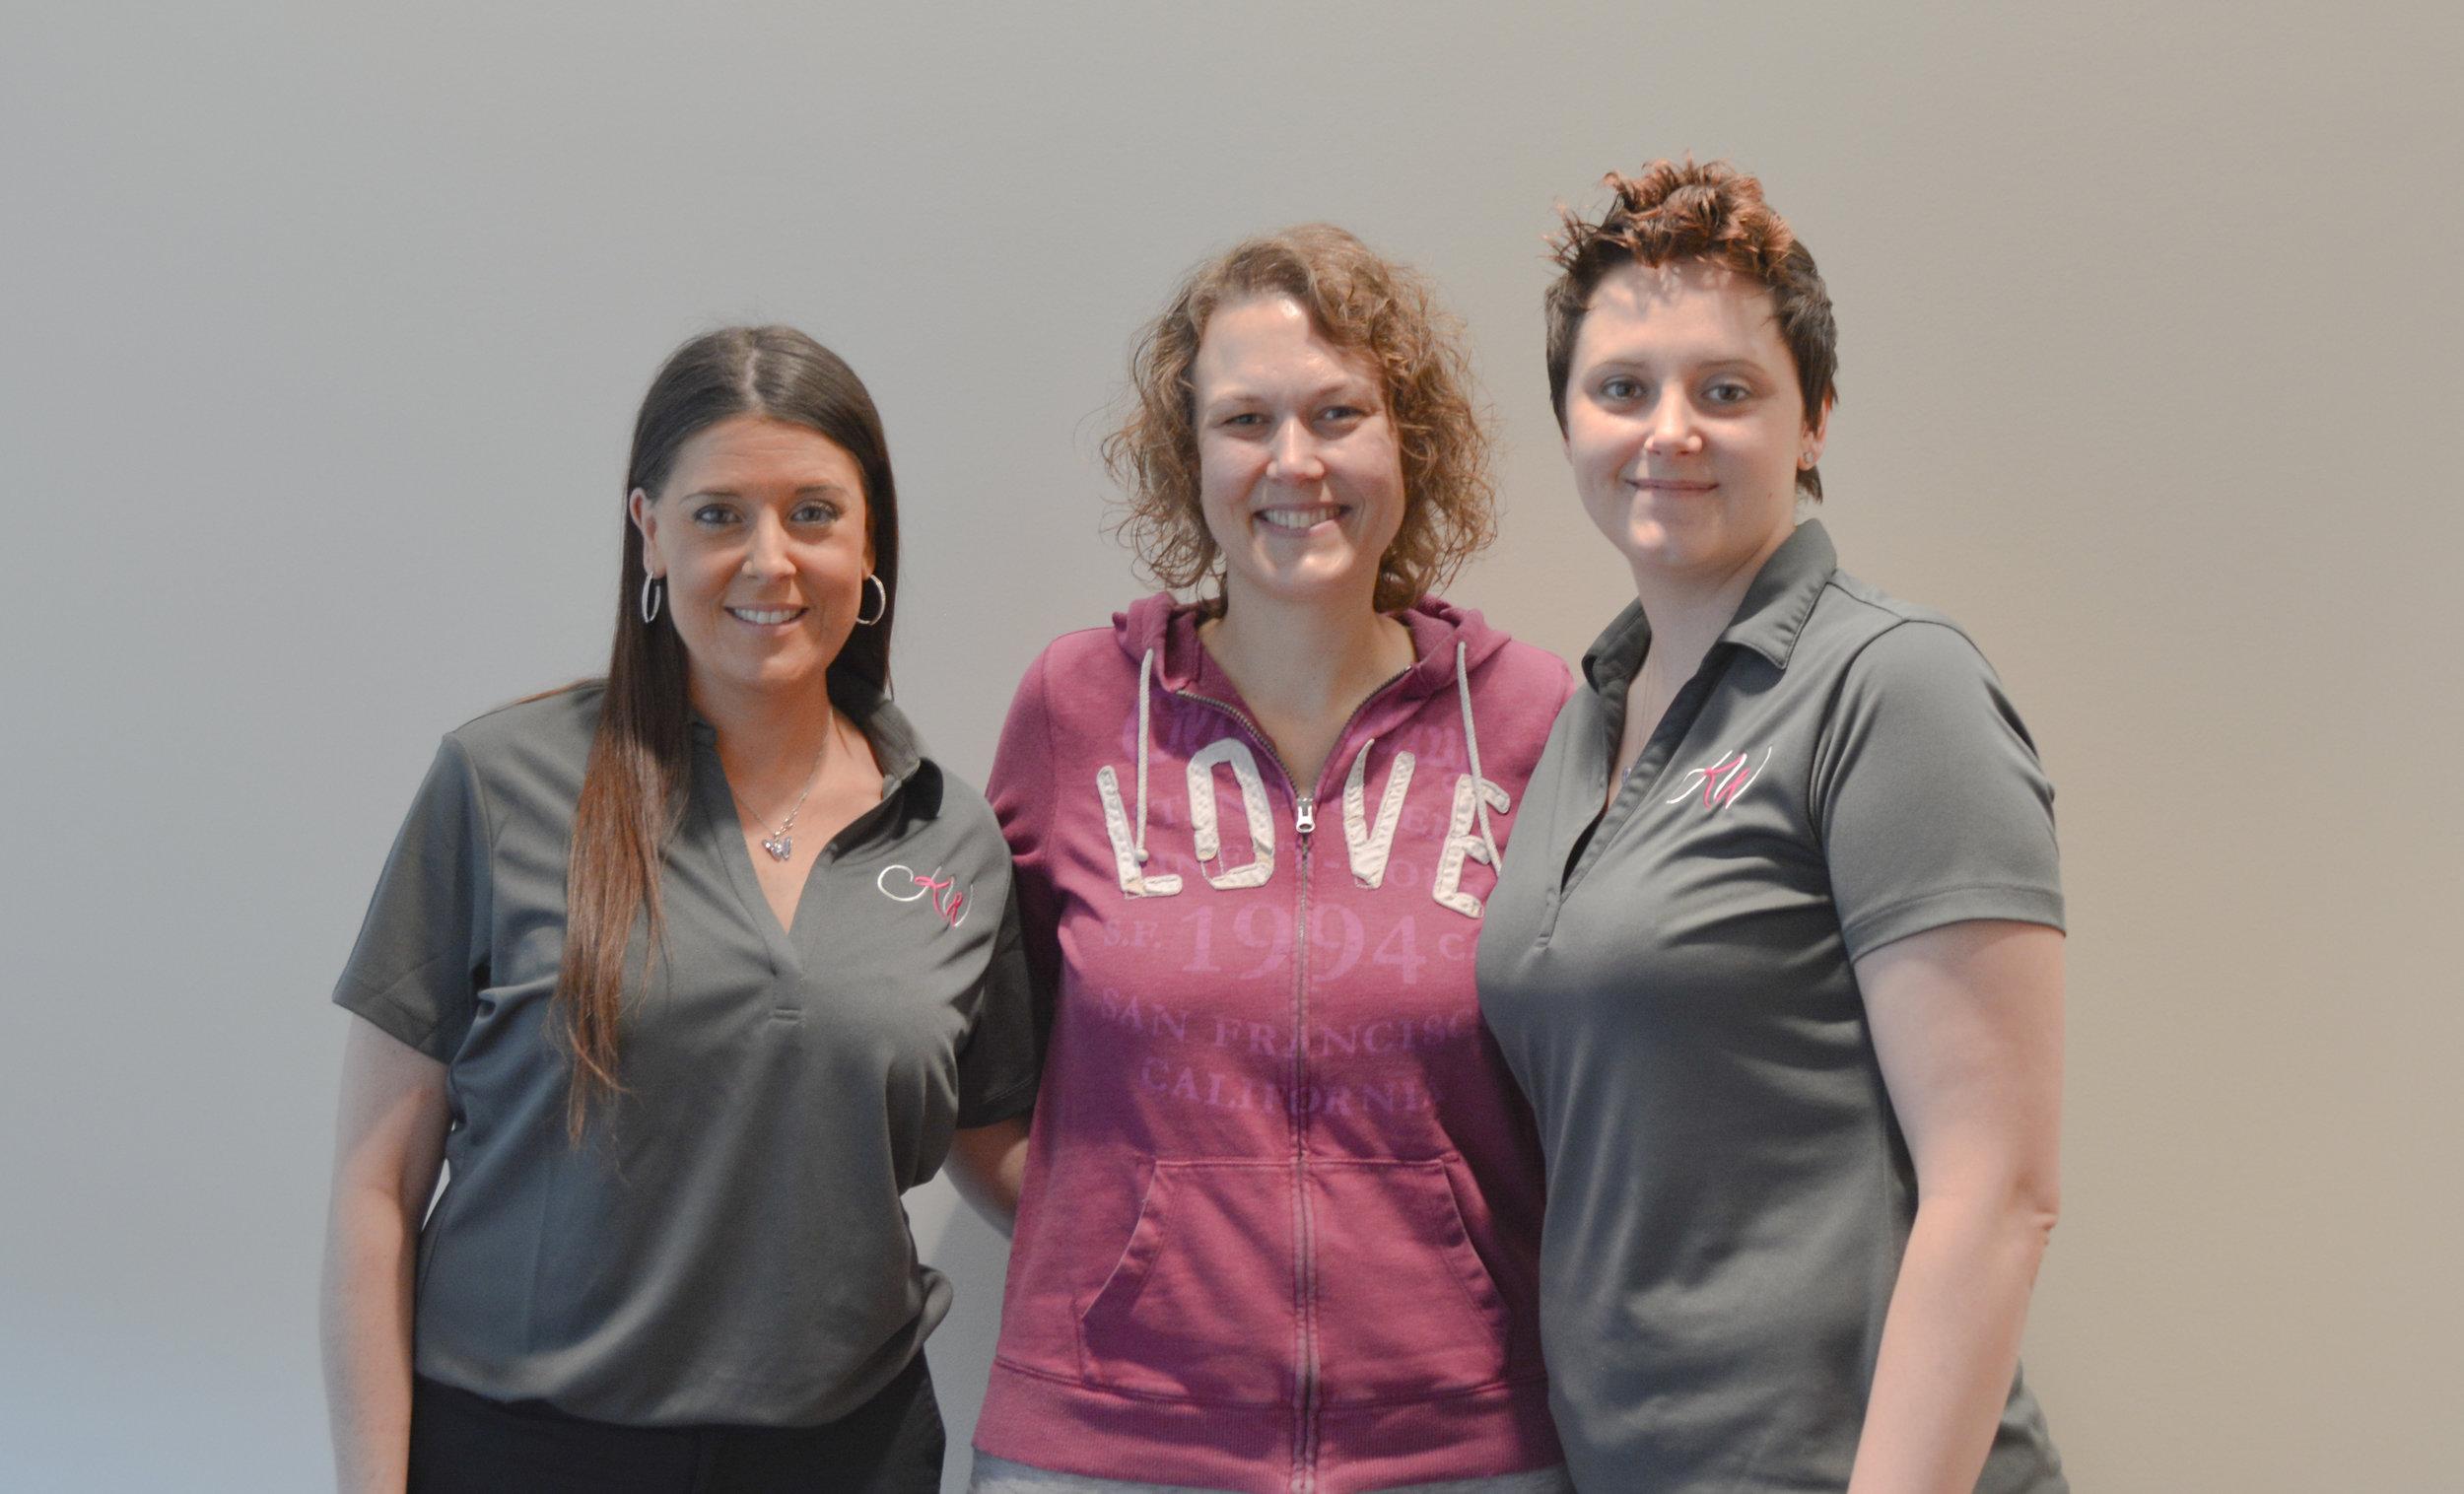 Sherri McKinney, Heather and Kristina Russell - 04/02/19